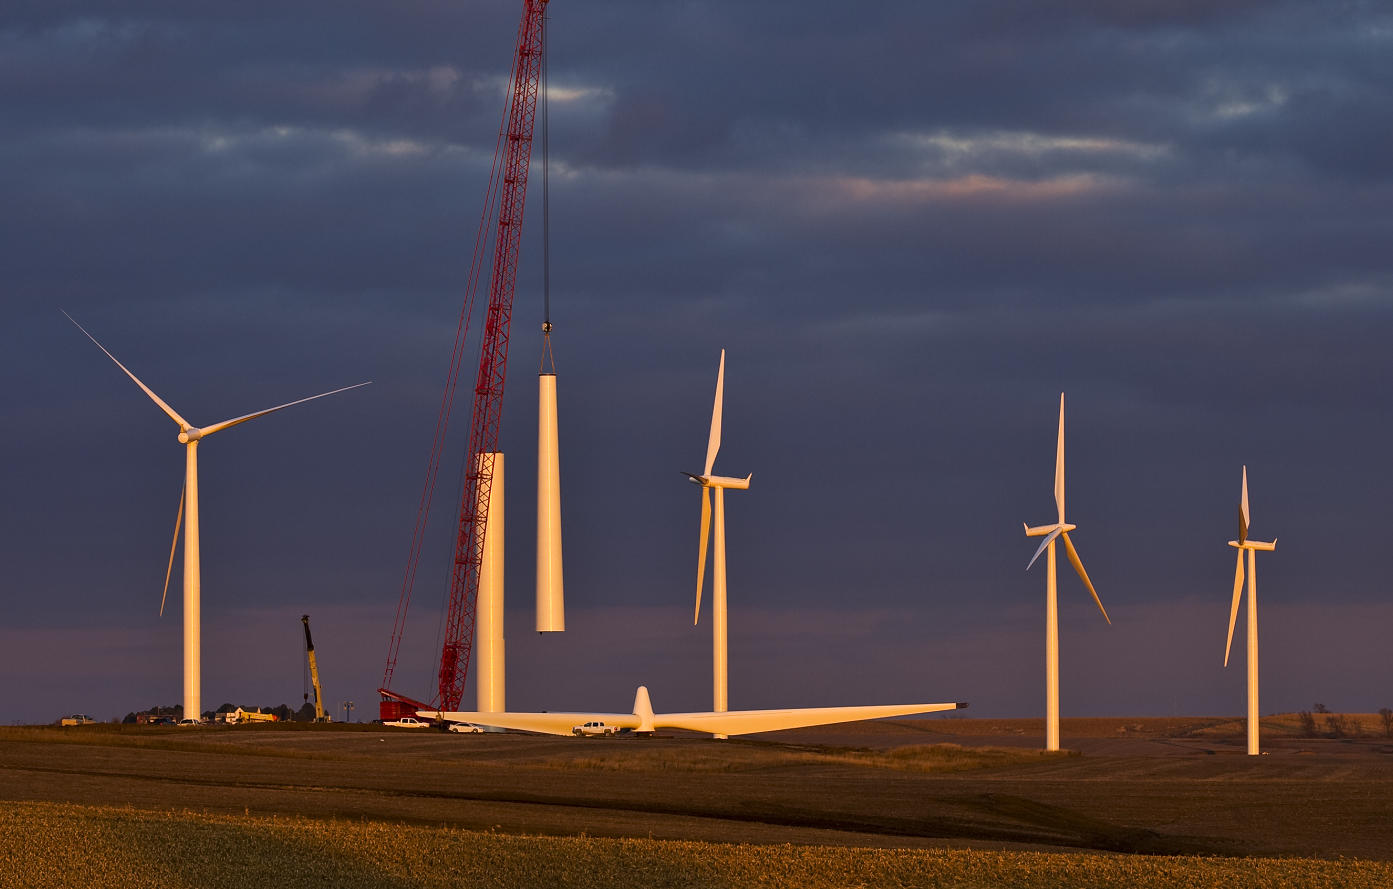 Turbine under construction, red crane